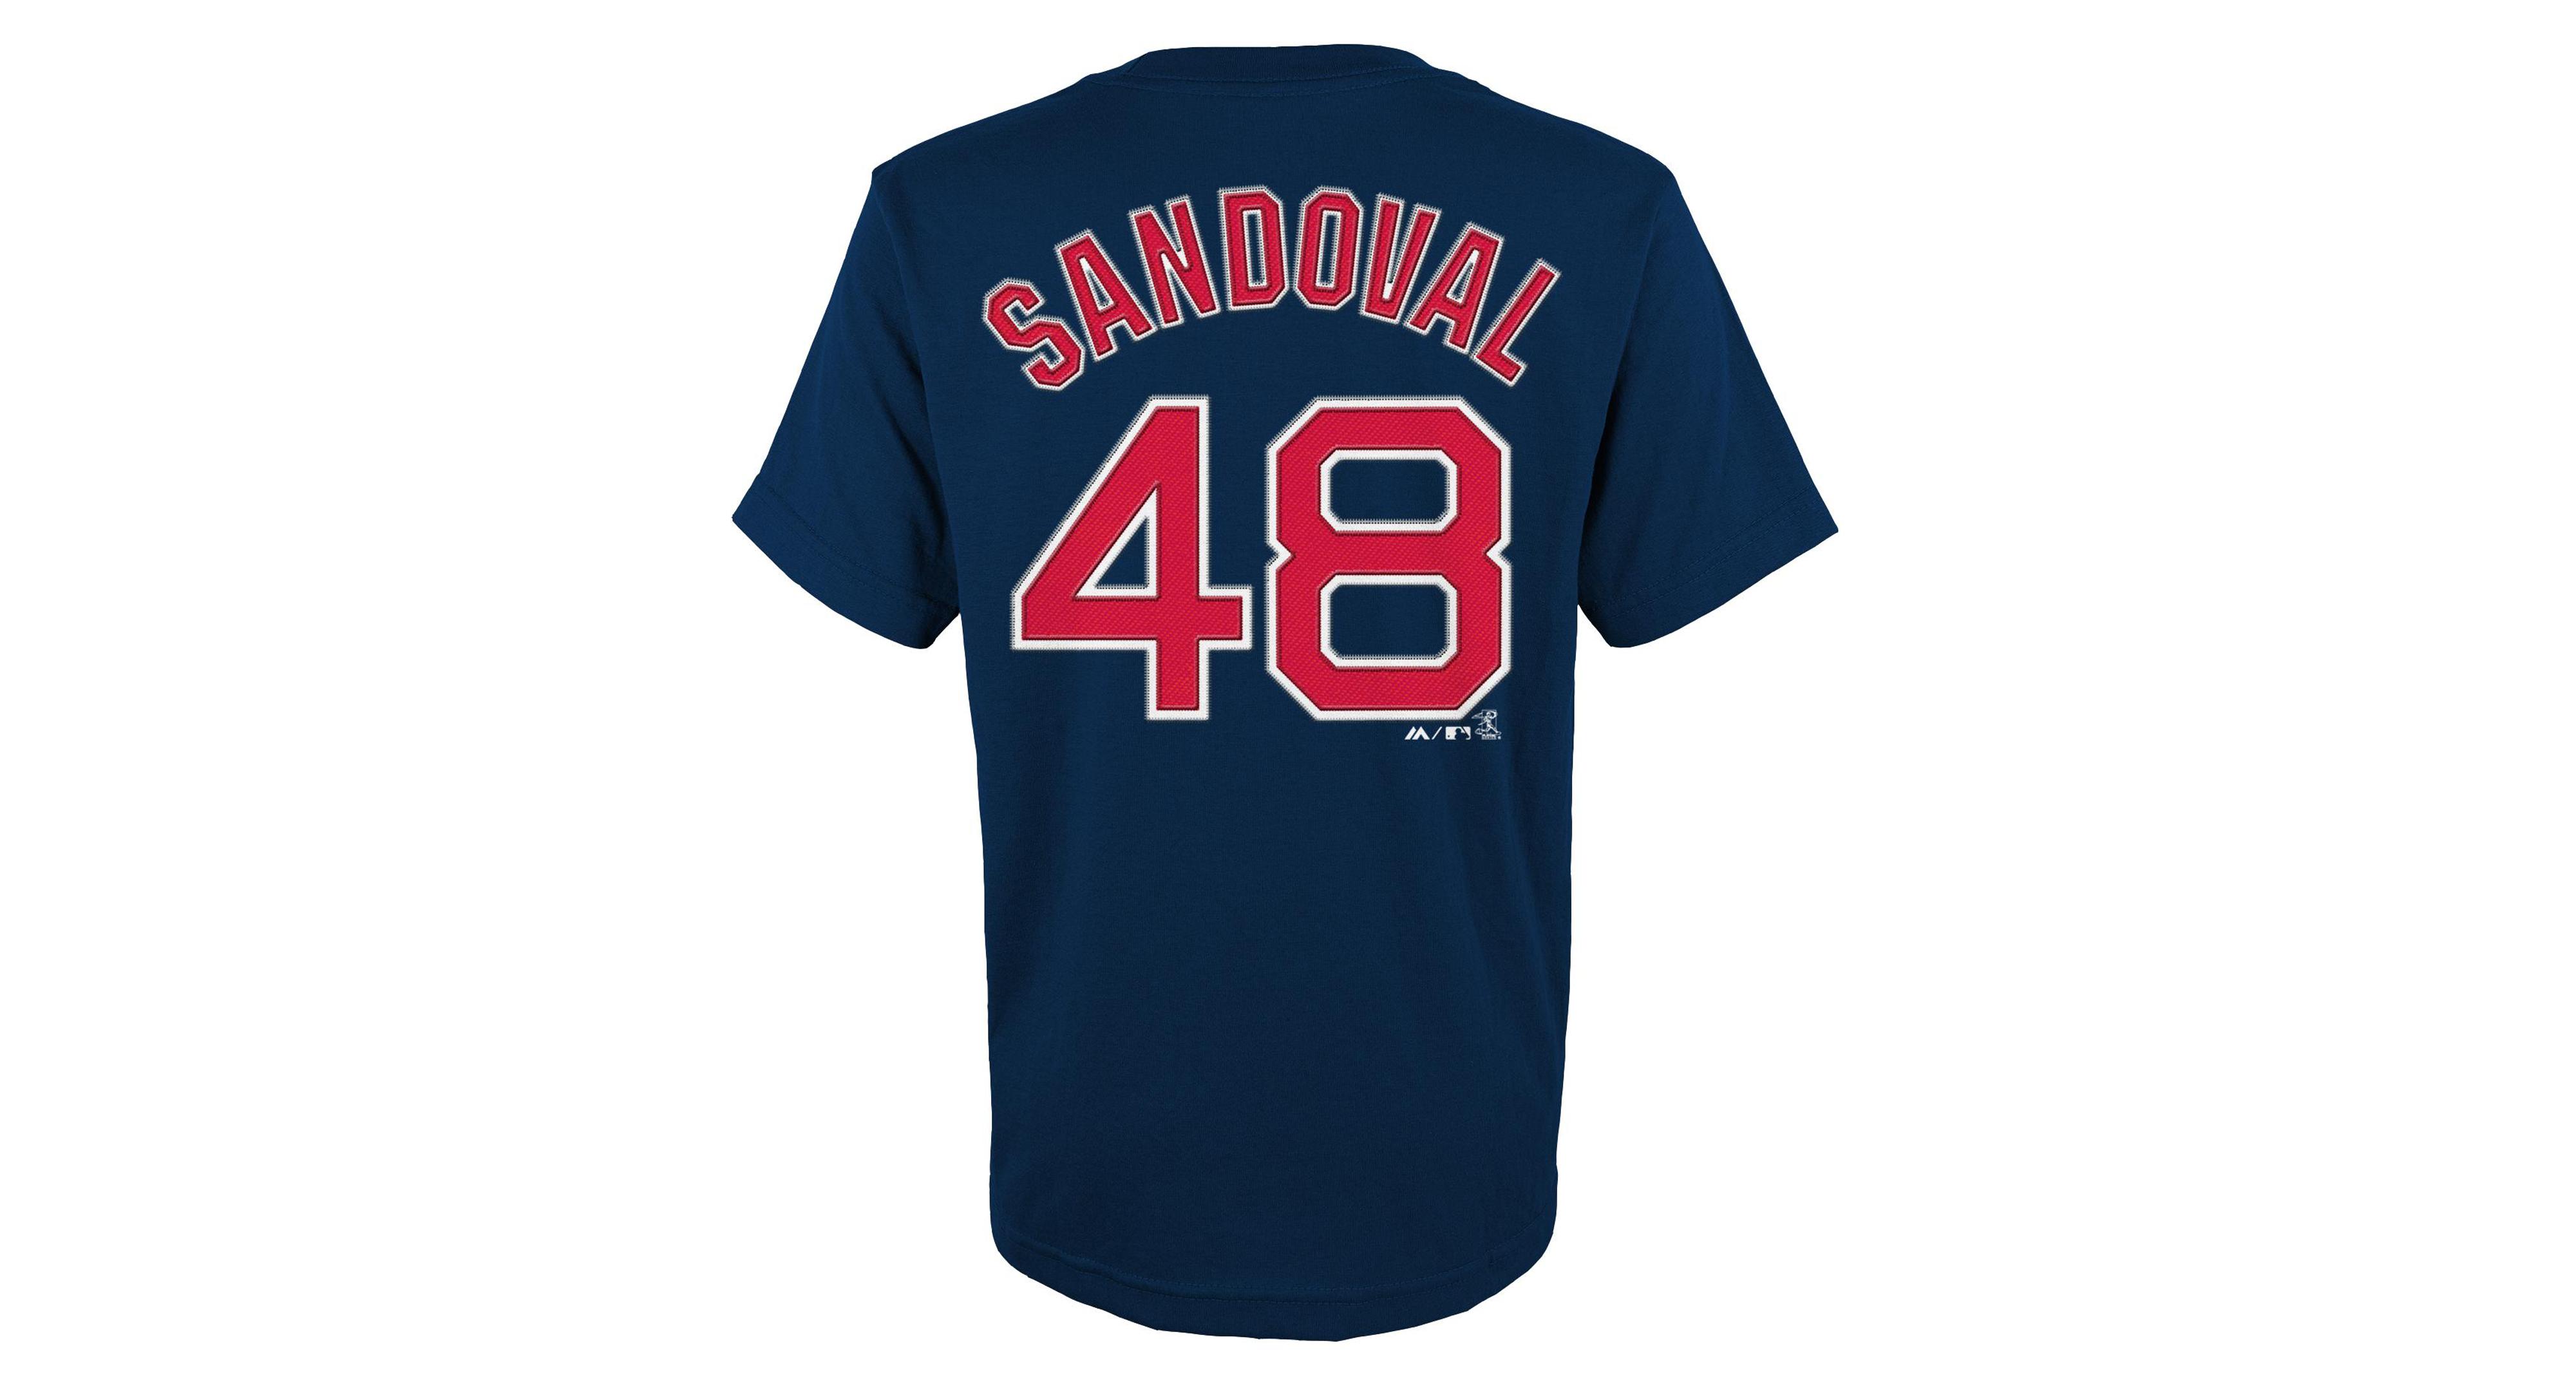 on sale 1097f a0165 Majestic Kids' Pablo Sandoval Boston Red Sox Player T-Shirt ...